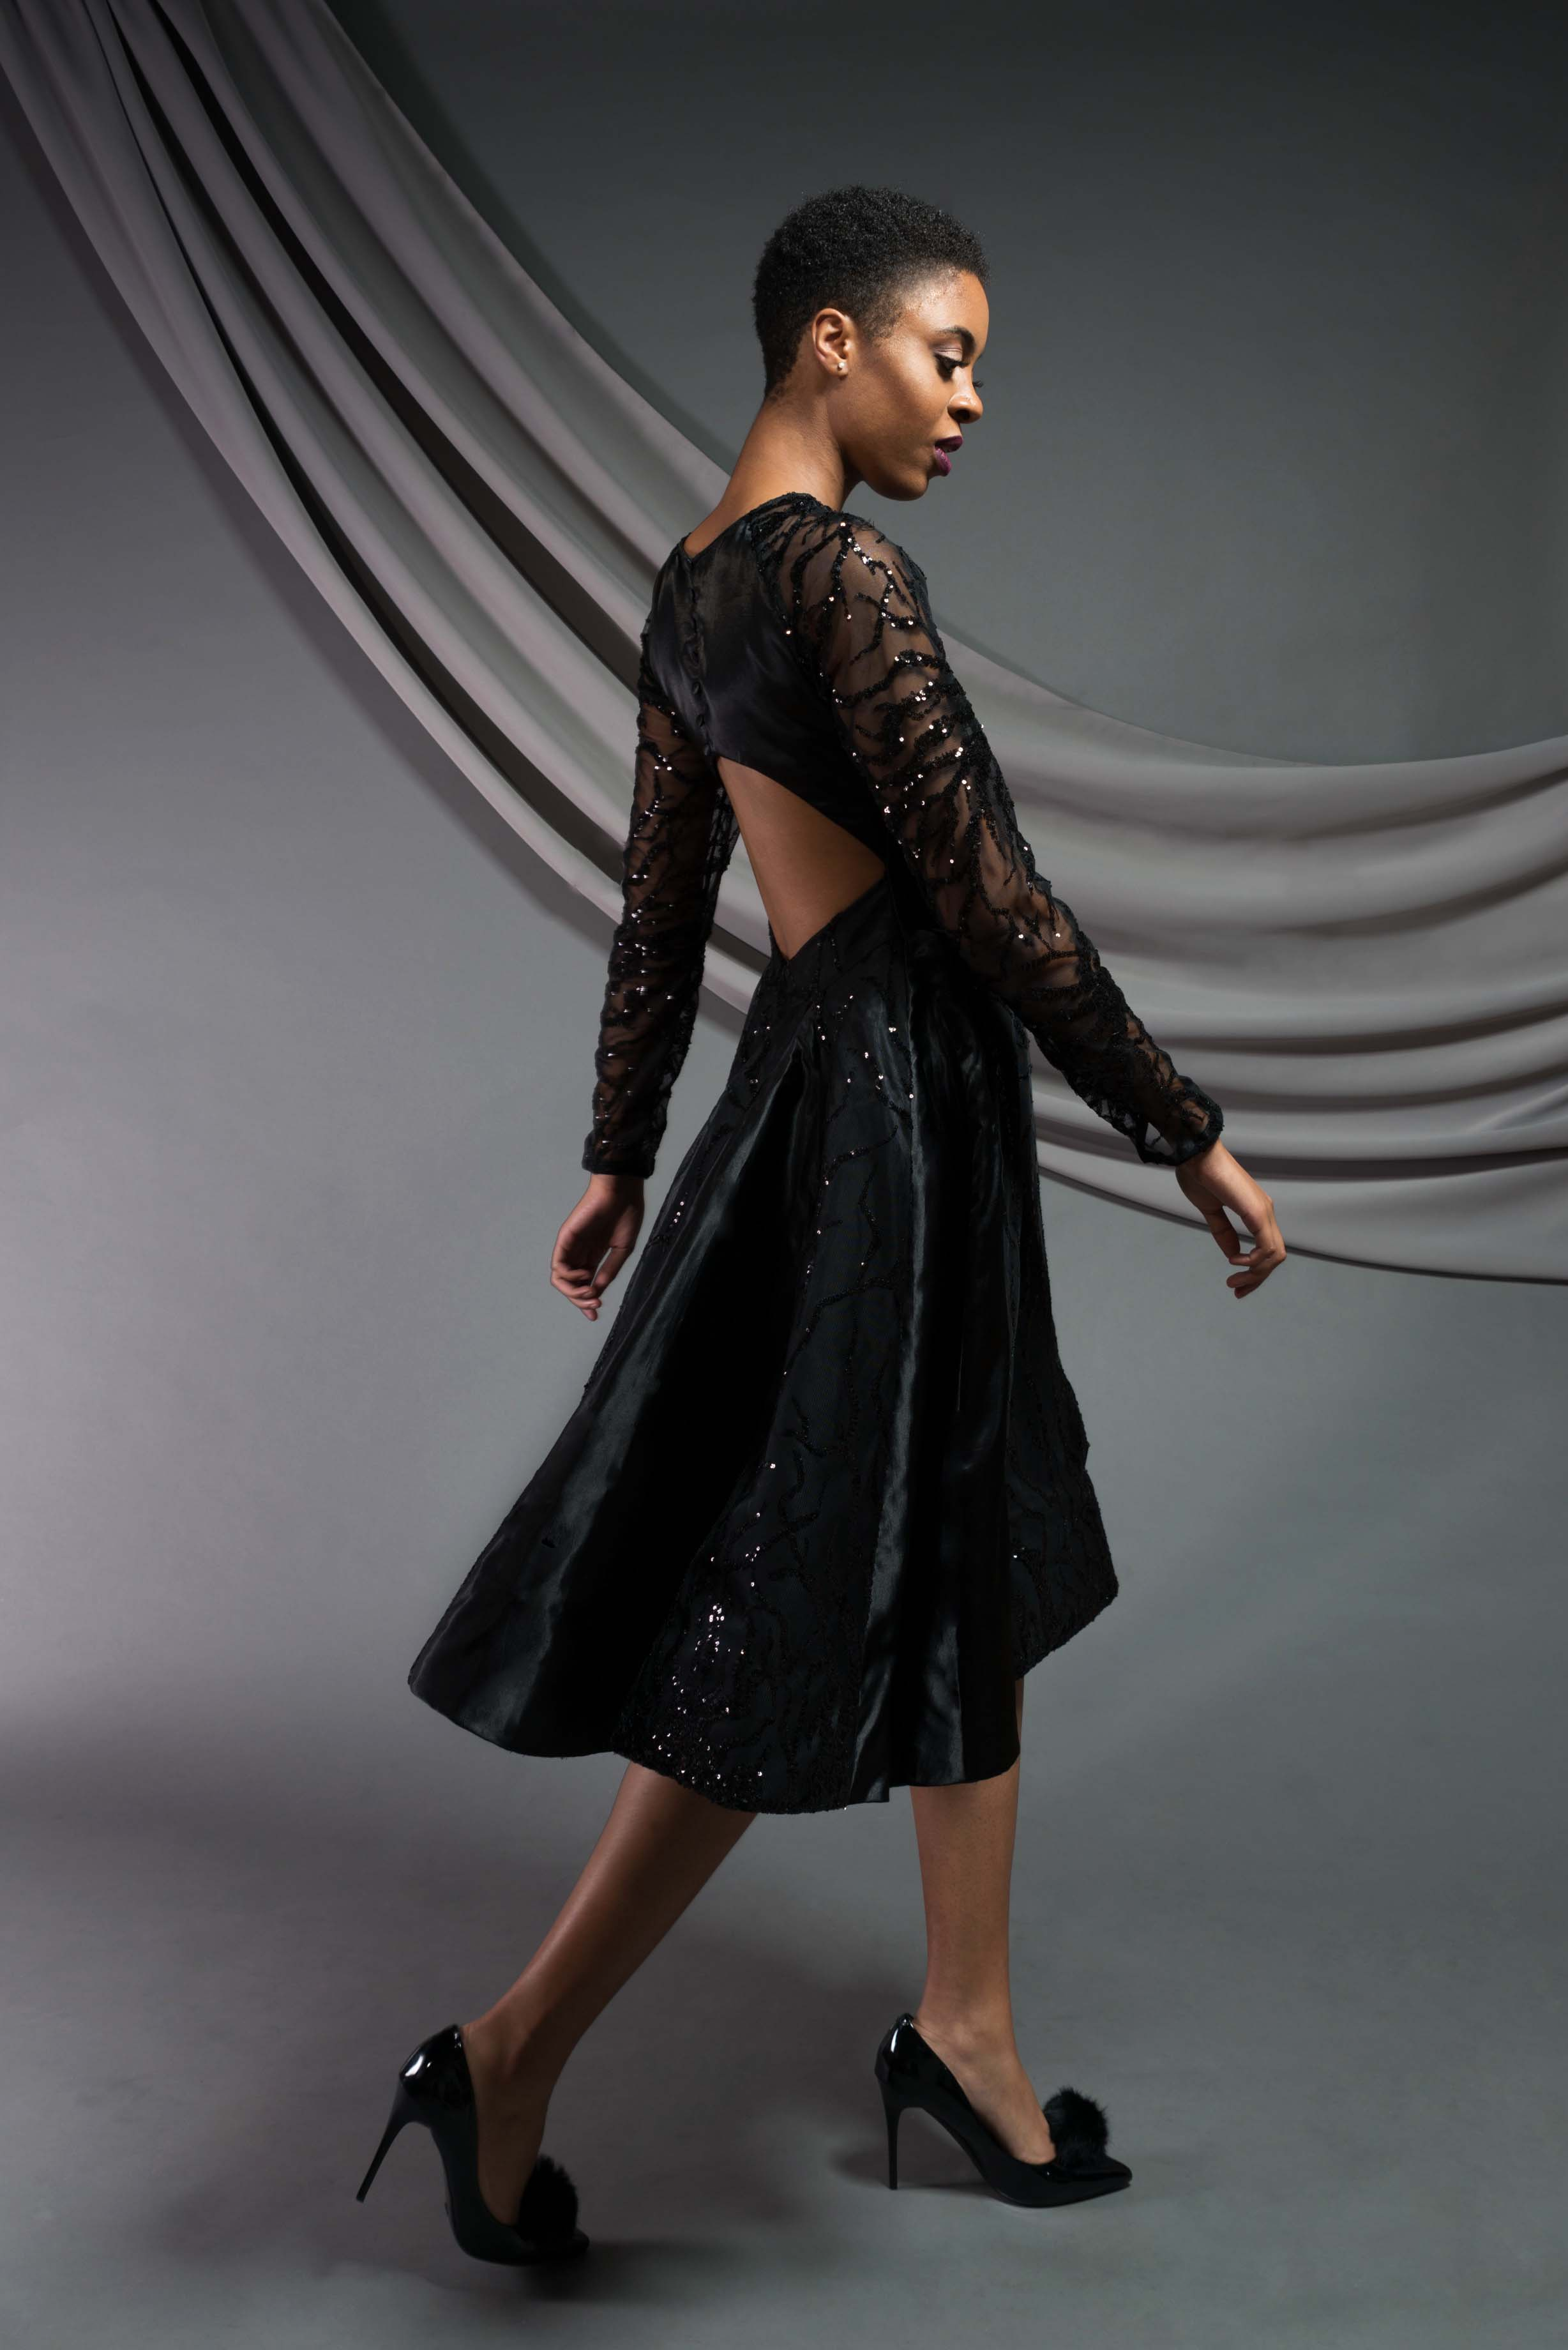 black-sequin-gown-lb.jpg